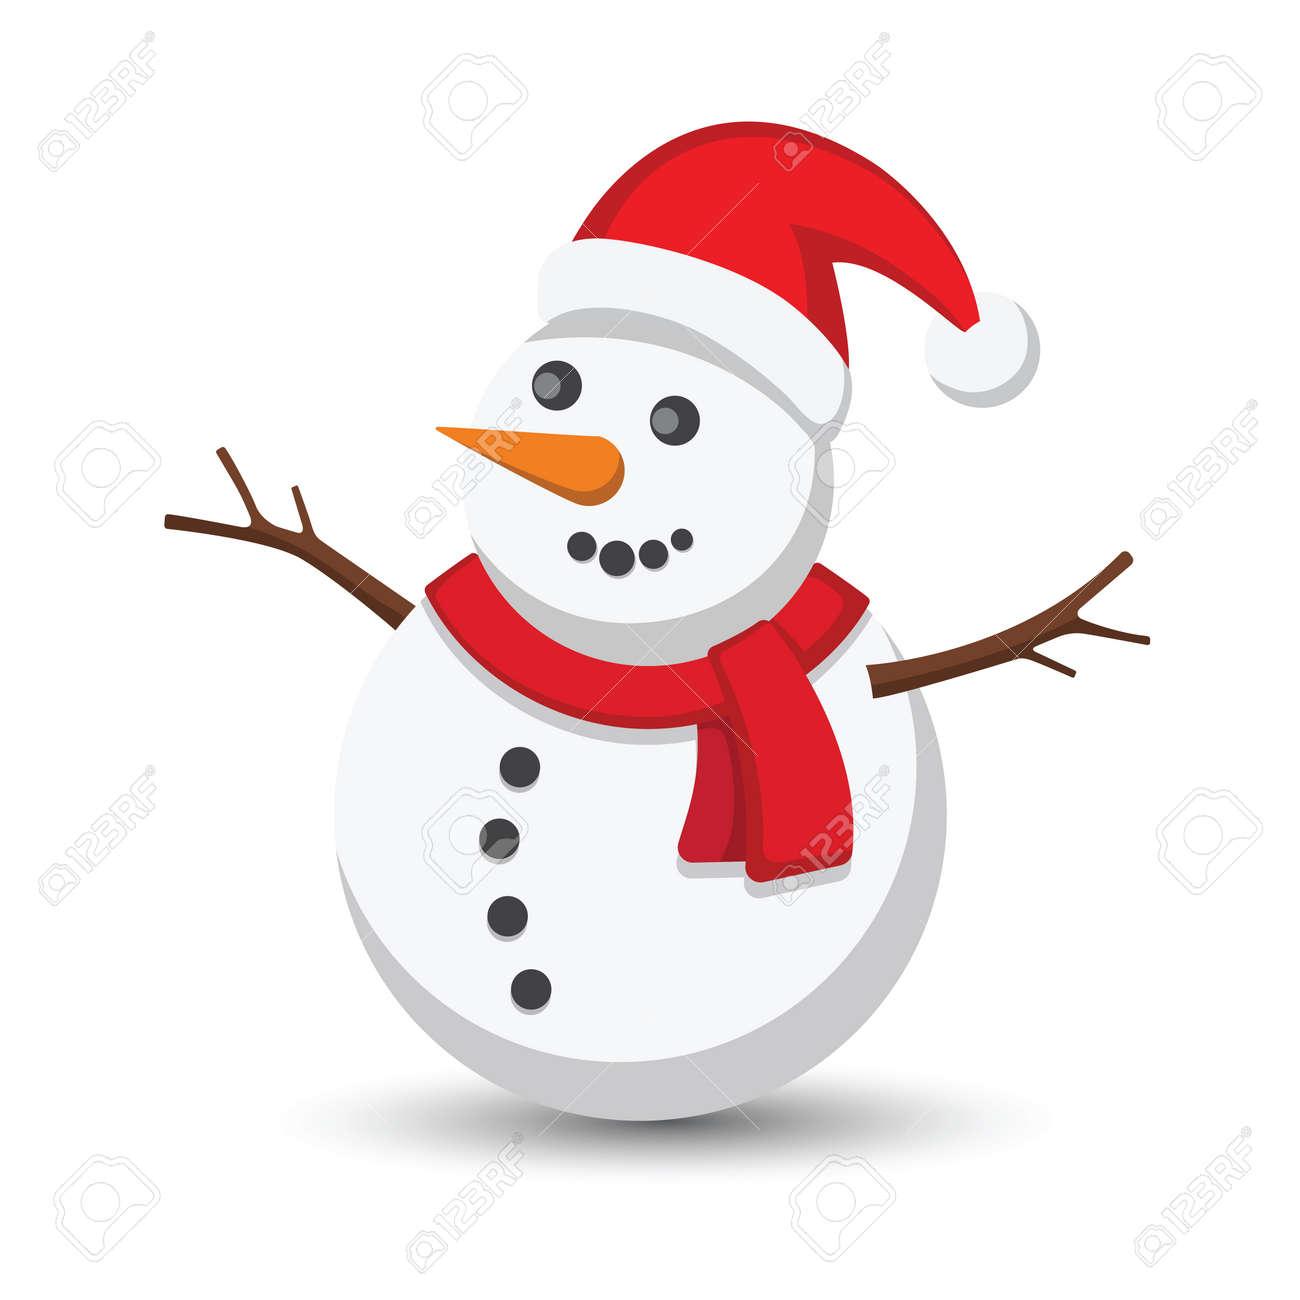 Snowman vector illustration on white background Stock Vector - 47791581